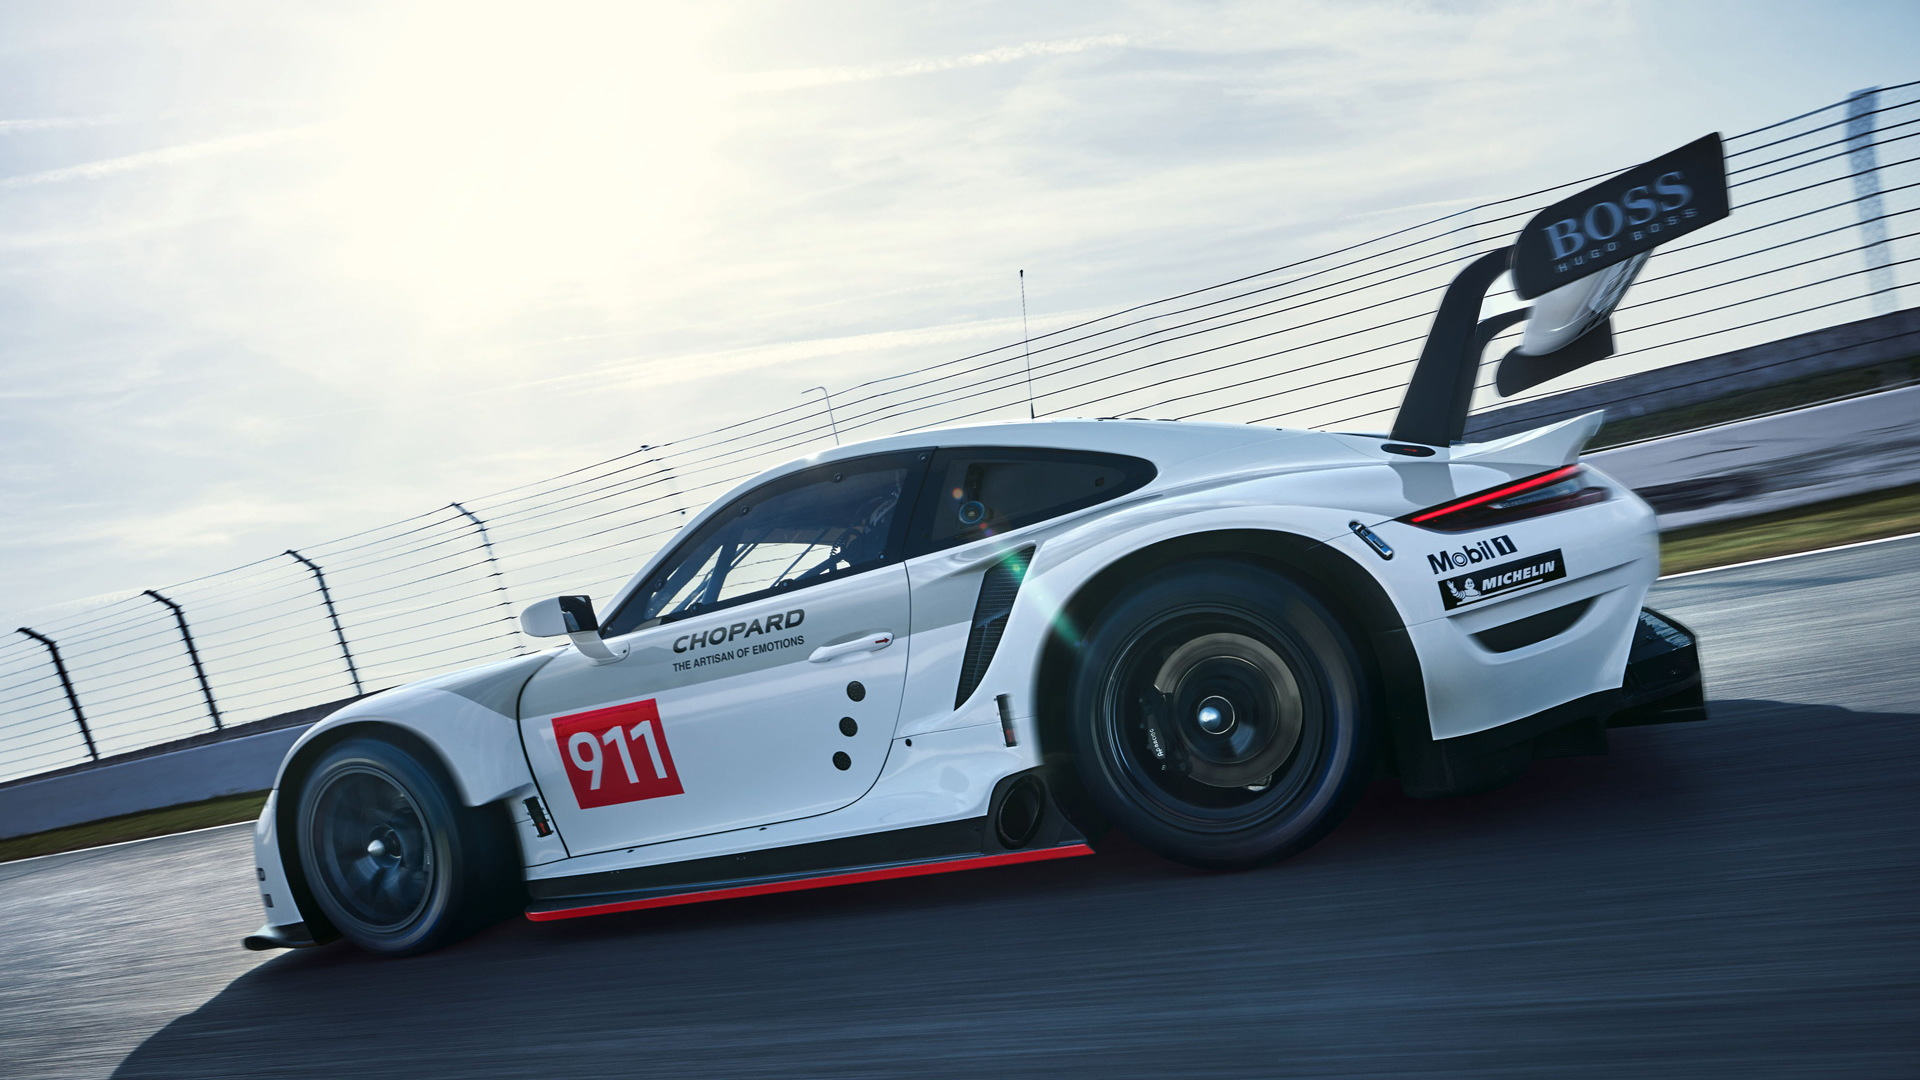 2019 Porsche 911 RSR race car